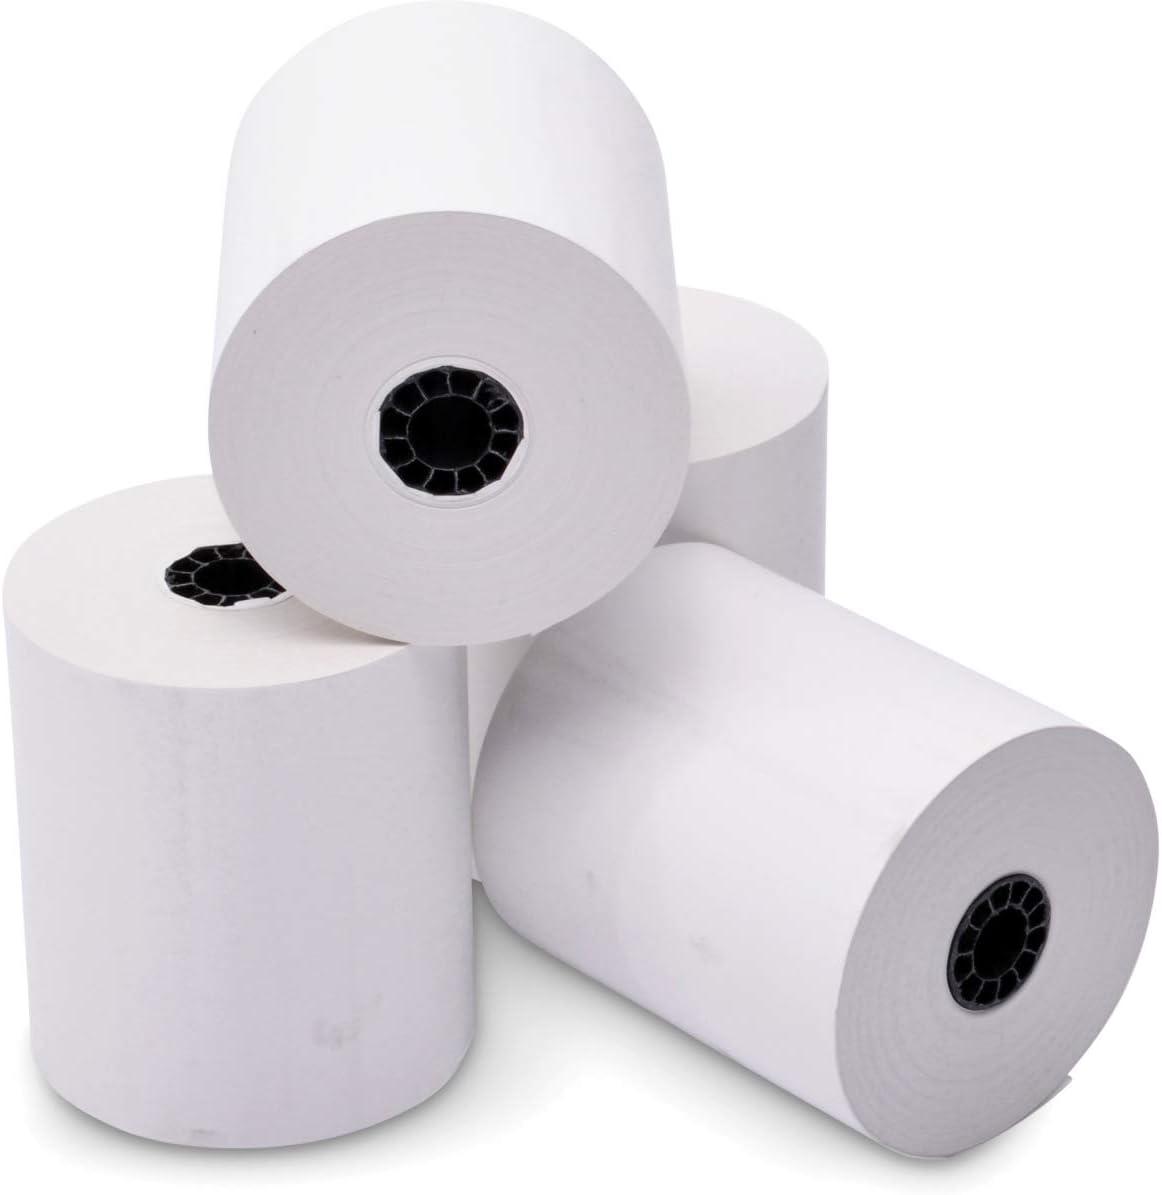 Ranking TOP3 ICONEX Thermal Print Receipt Paper - 3 50 8